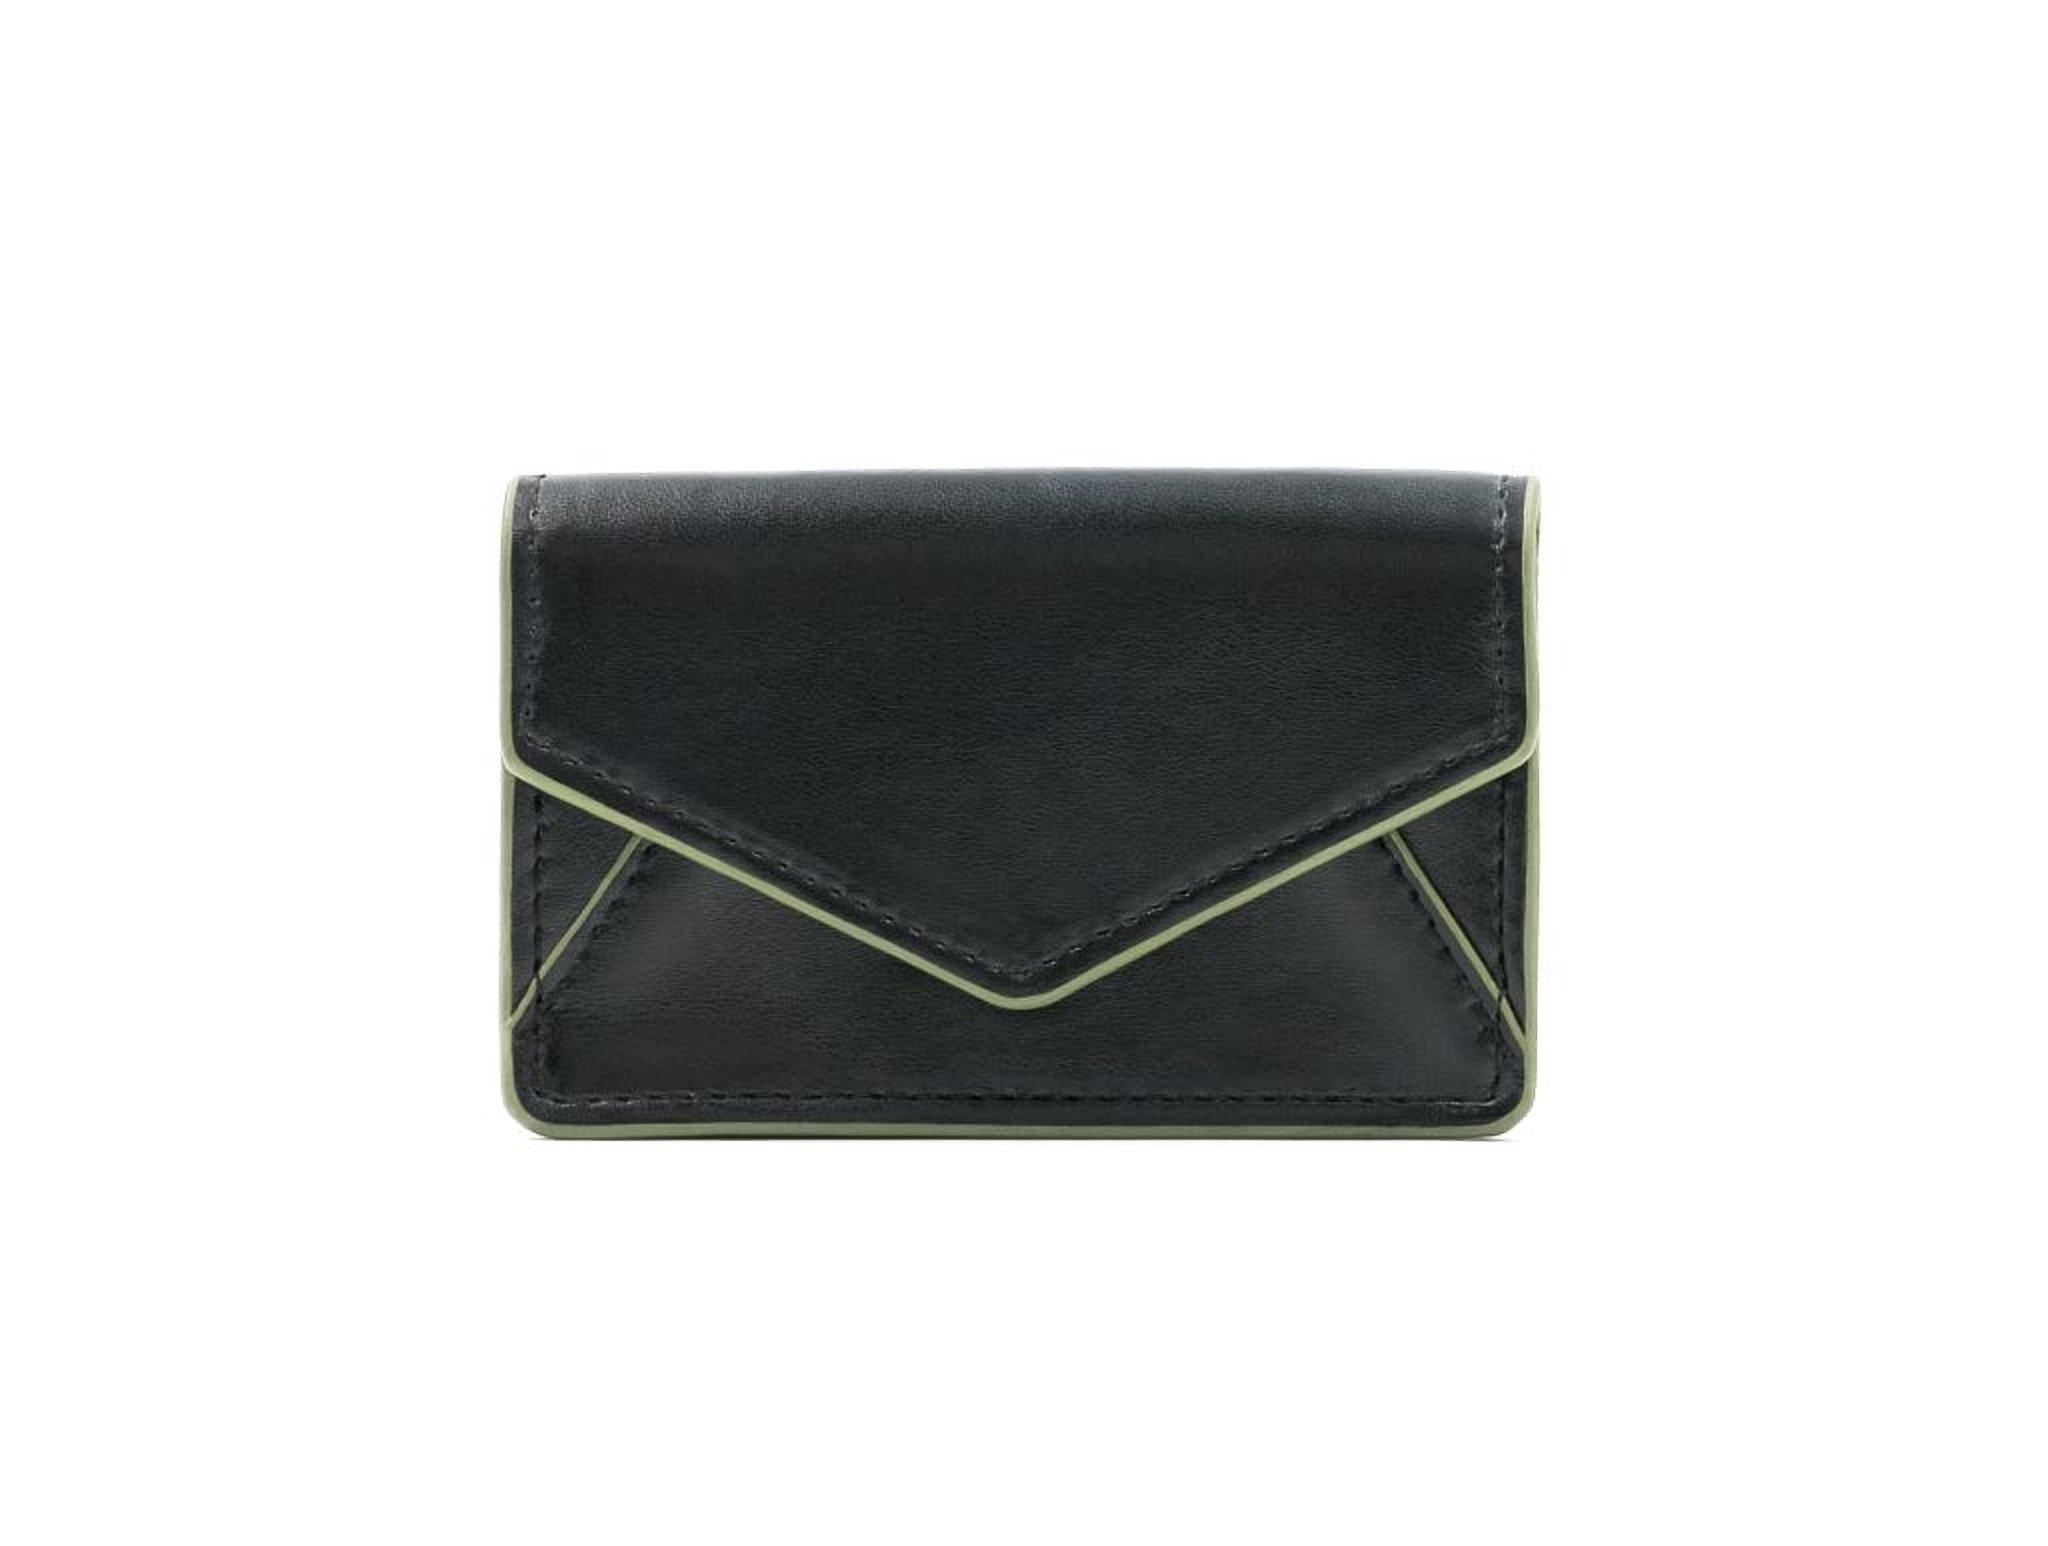 About Face Designs Bobbi Chicago Belmont Business Card Case Waist Pack, Black, One Size